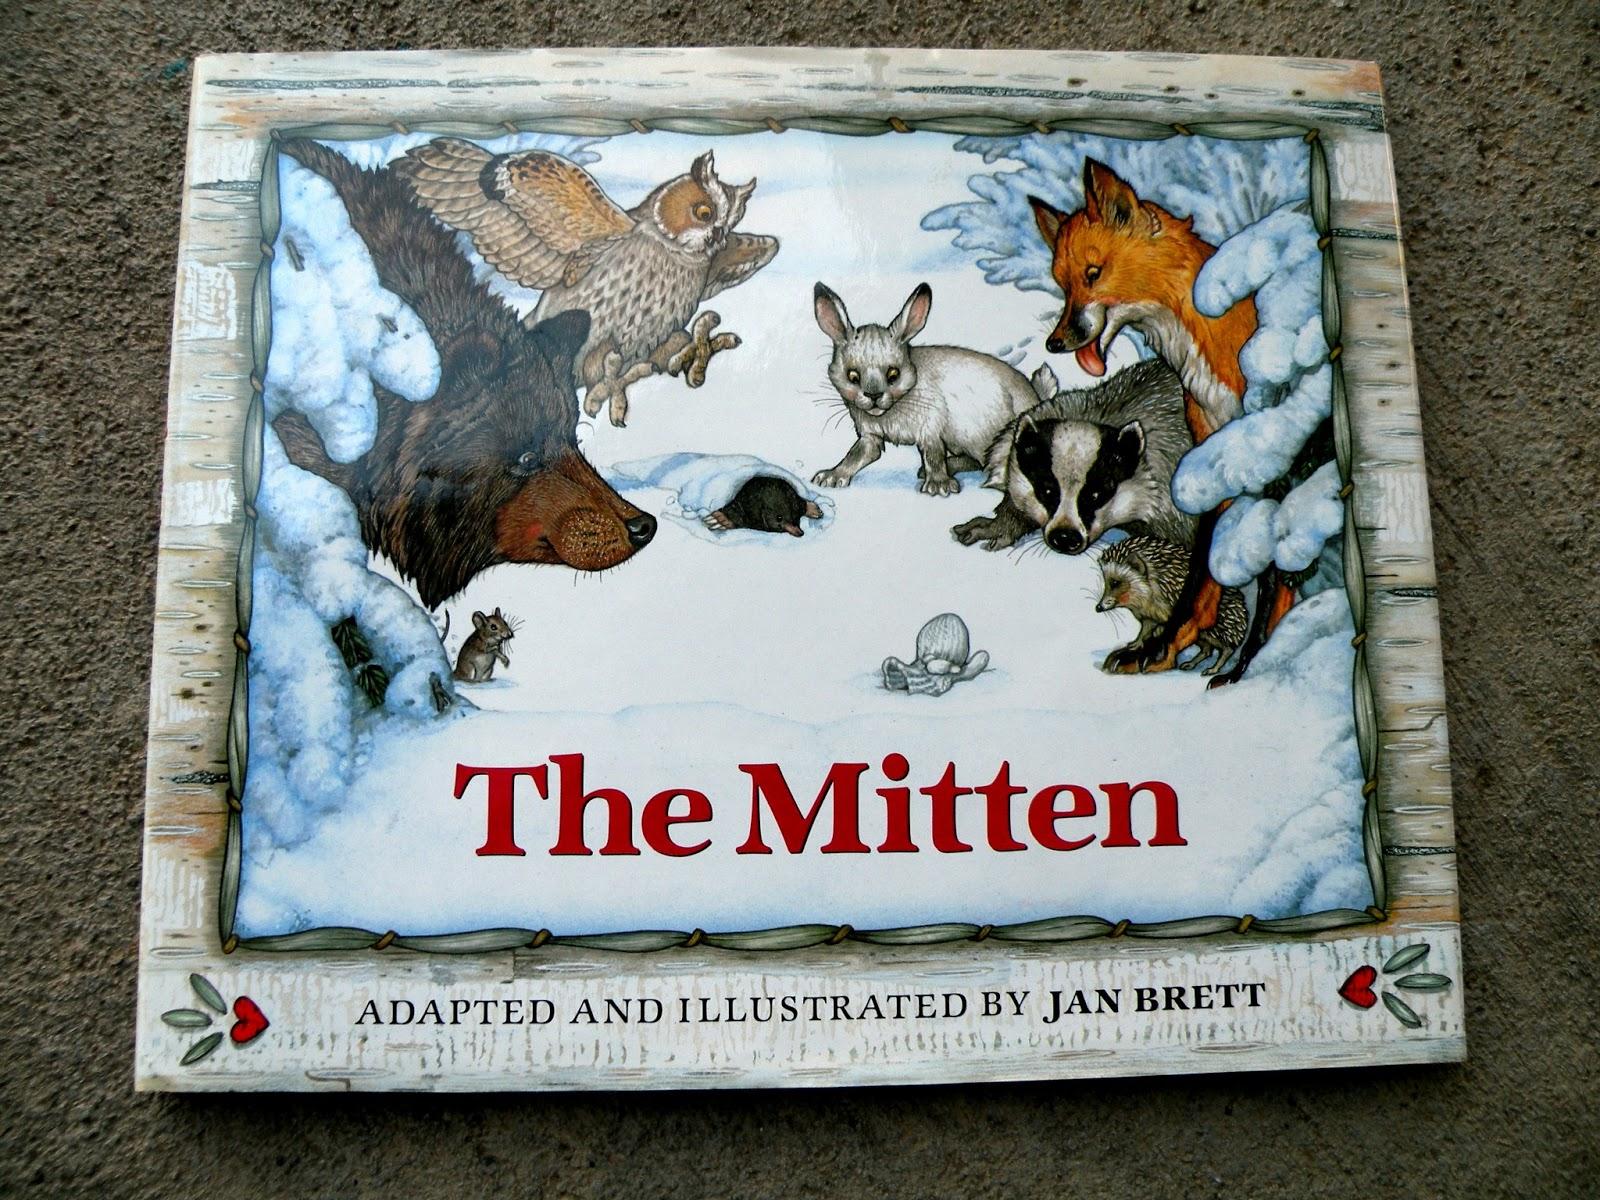 The Fantastic Five The Mitten Lapbooks